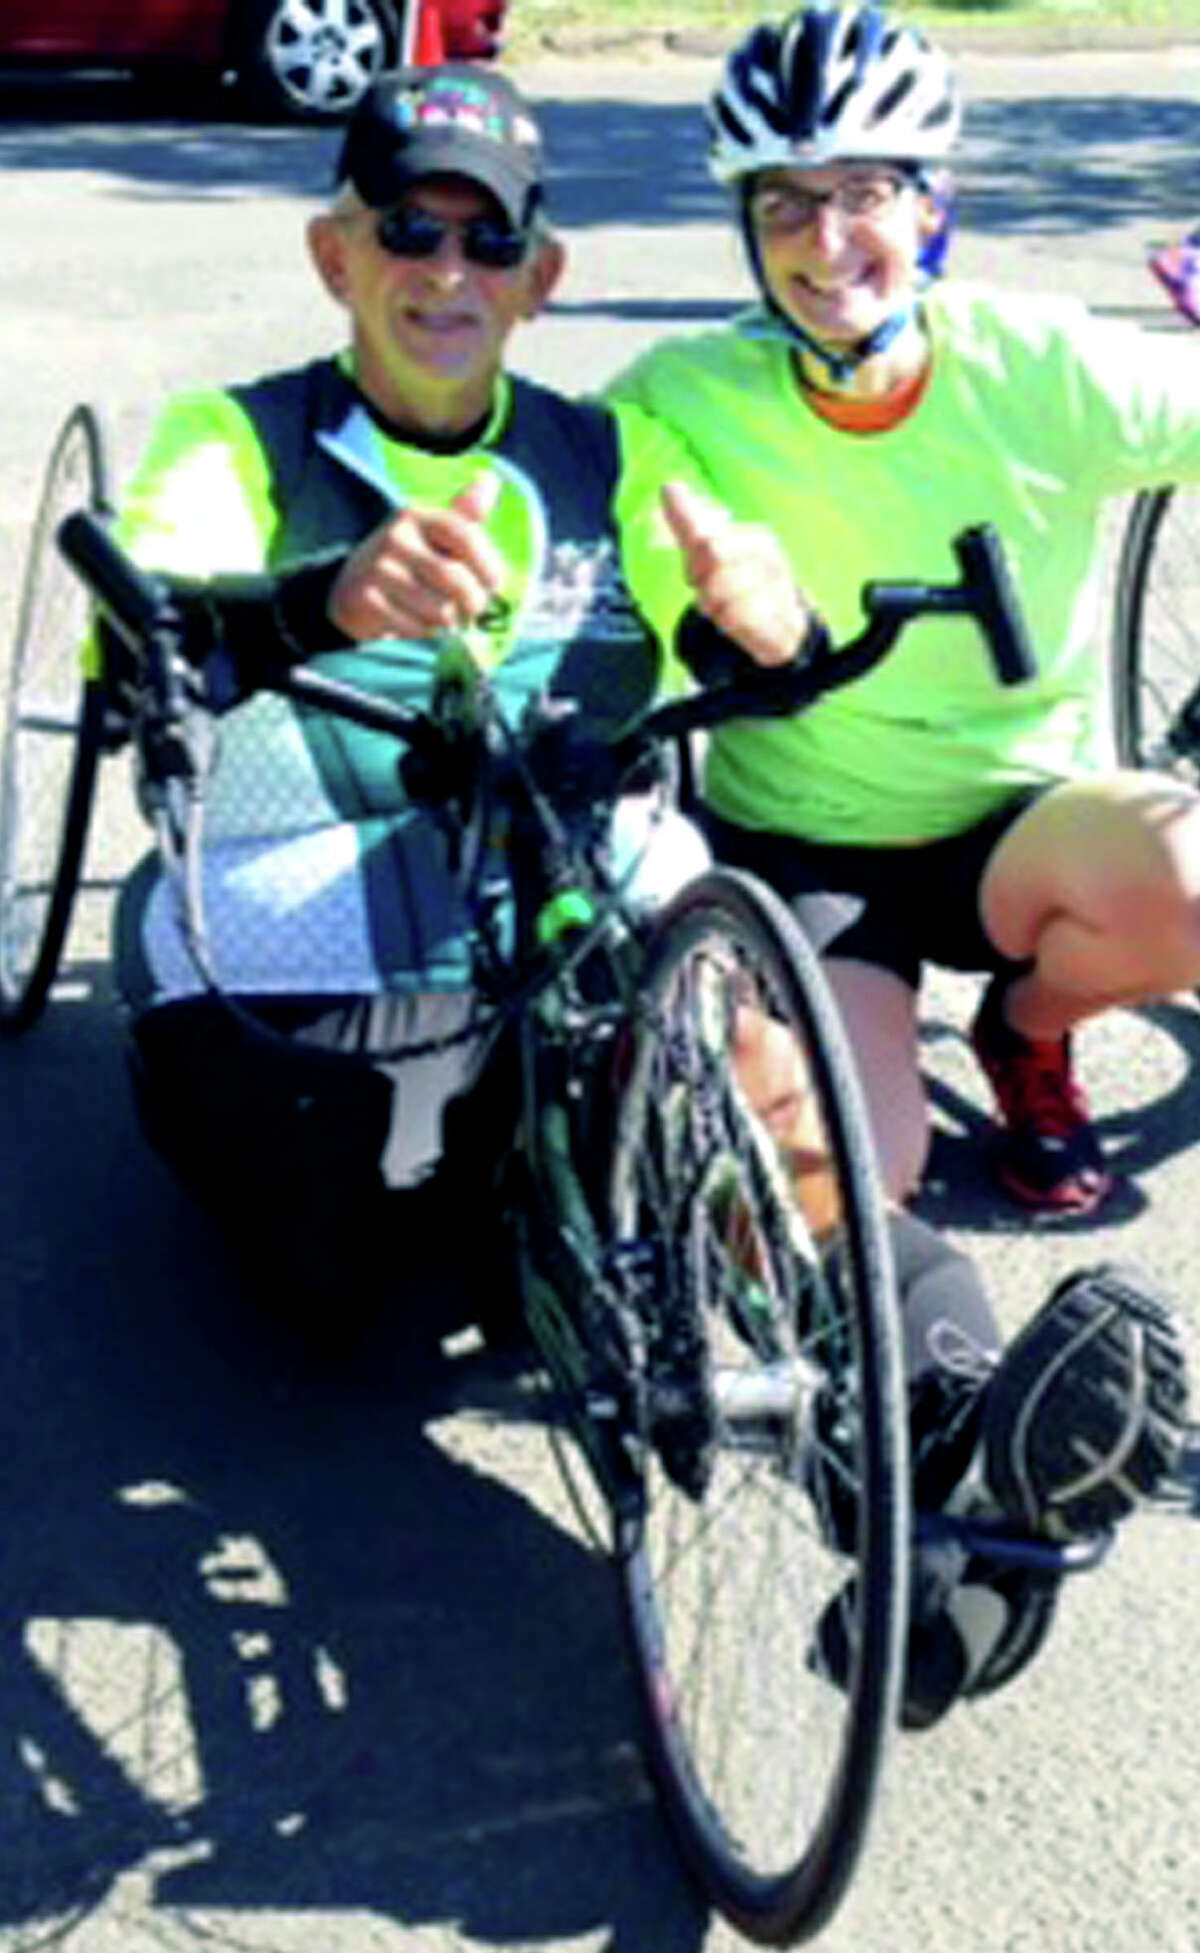 Tony Allegretti, left, of New Milford and a fellow athlete pose for a keepsake photo. Courtesy of Tony Allegretti